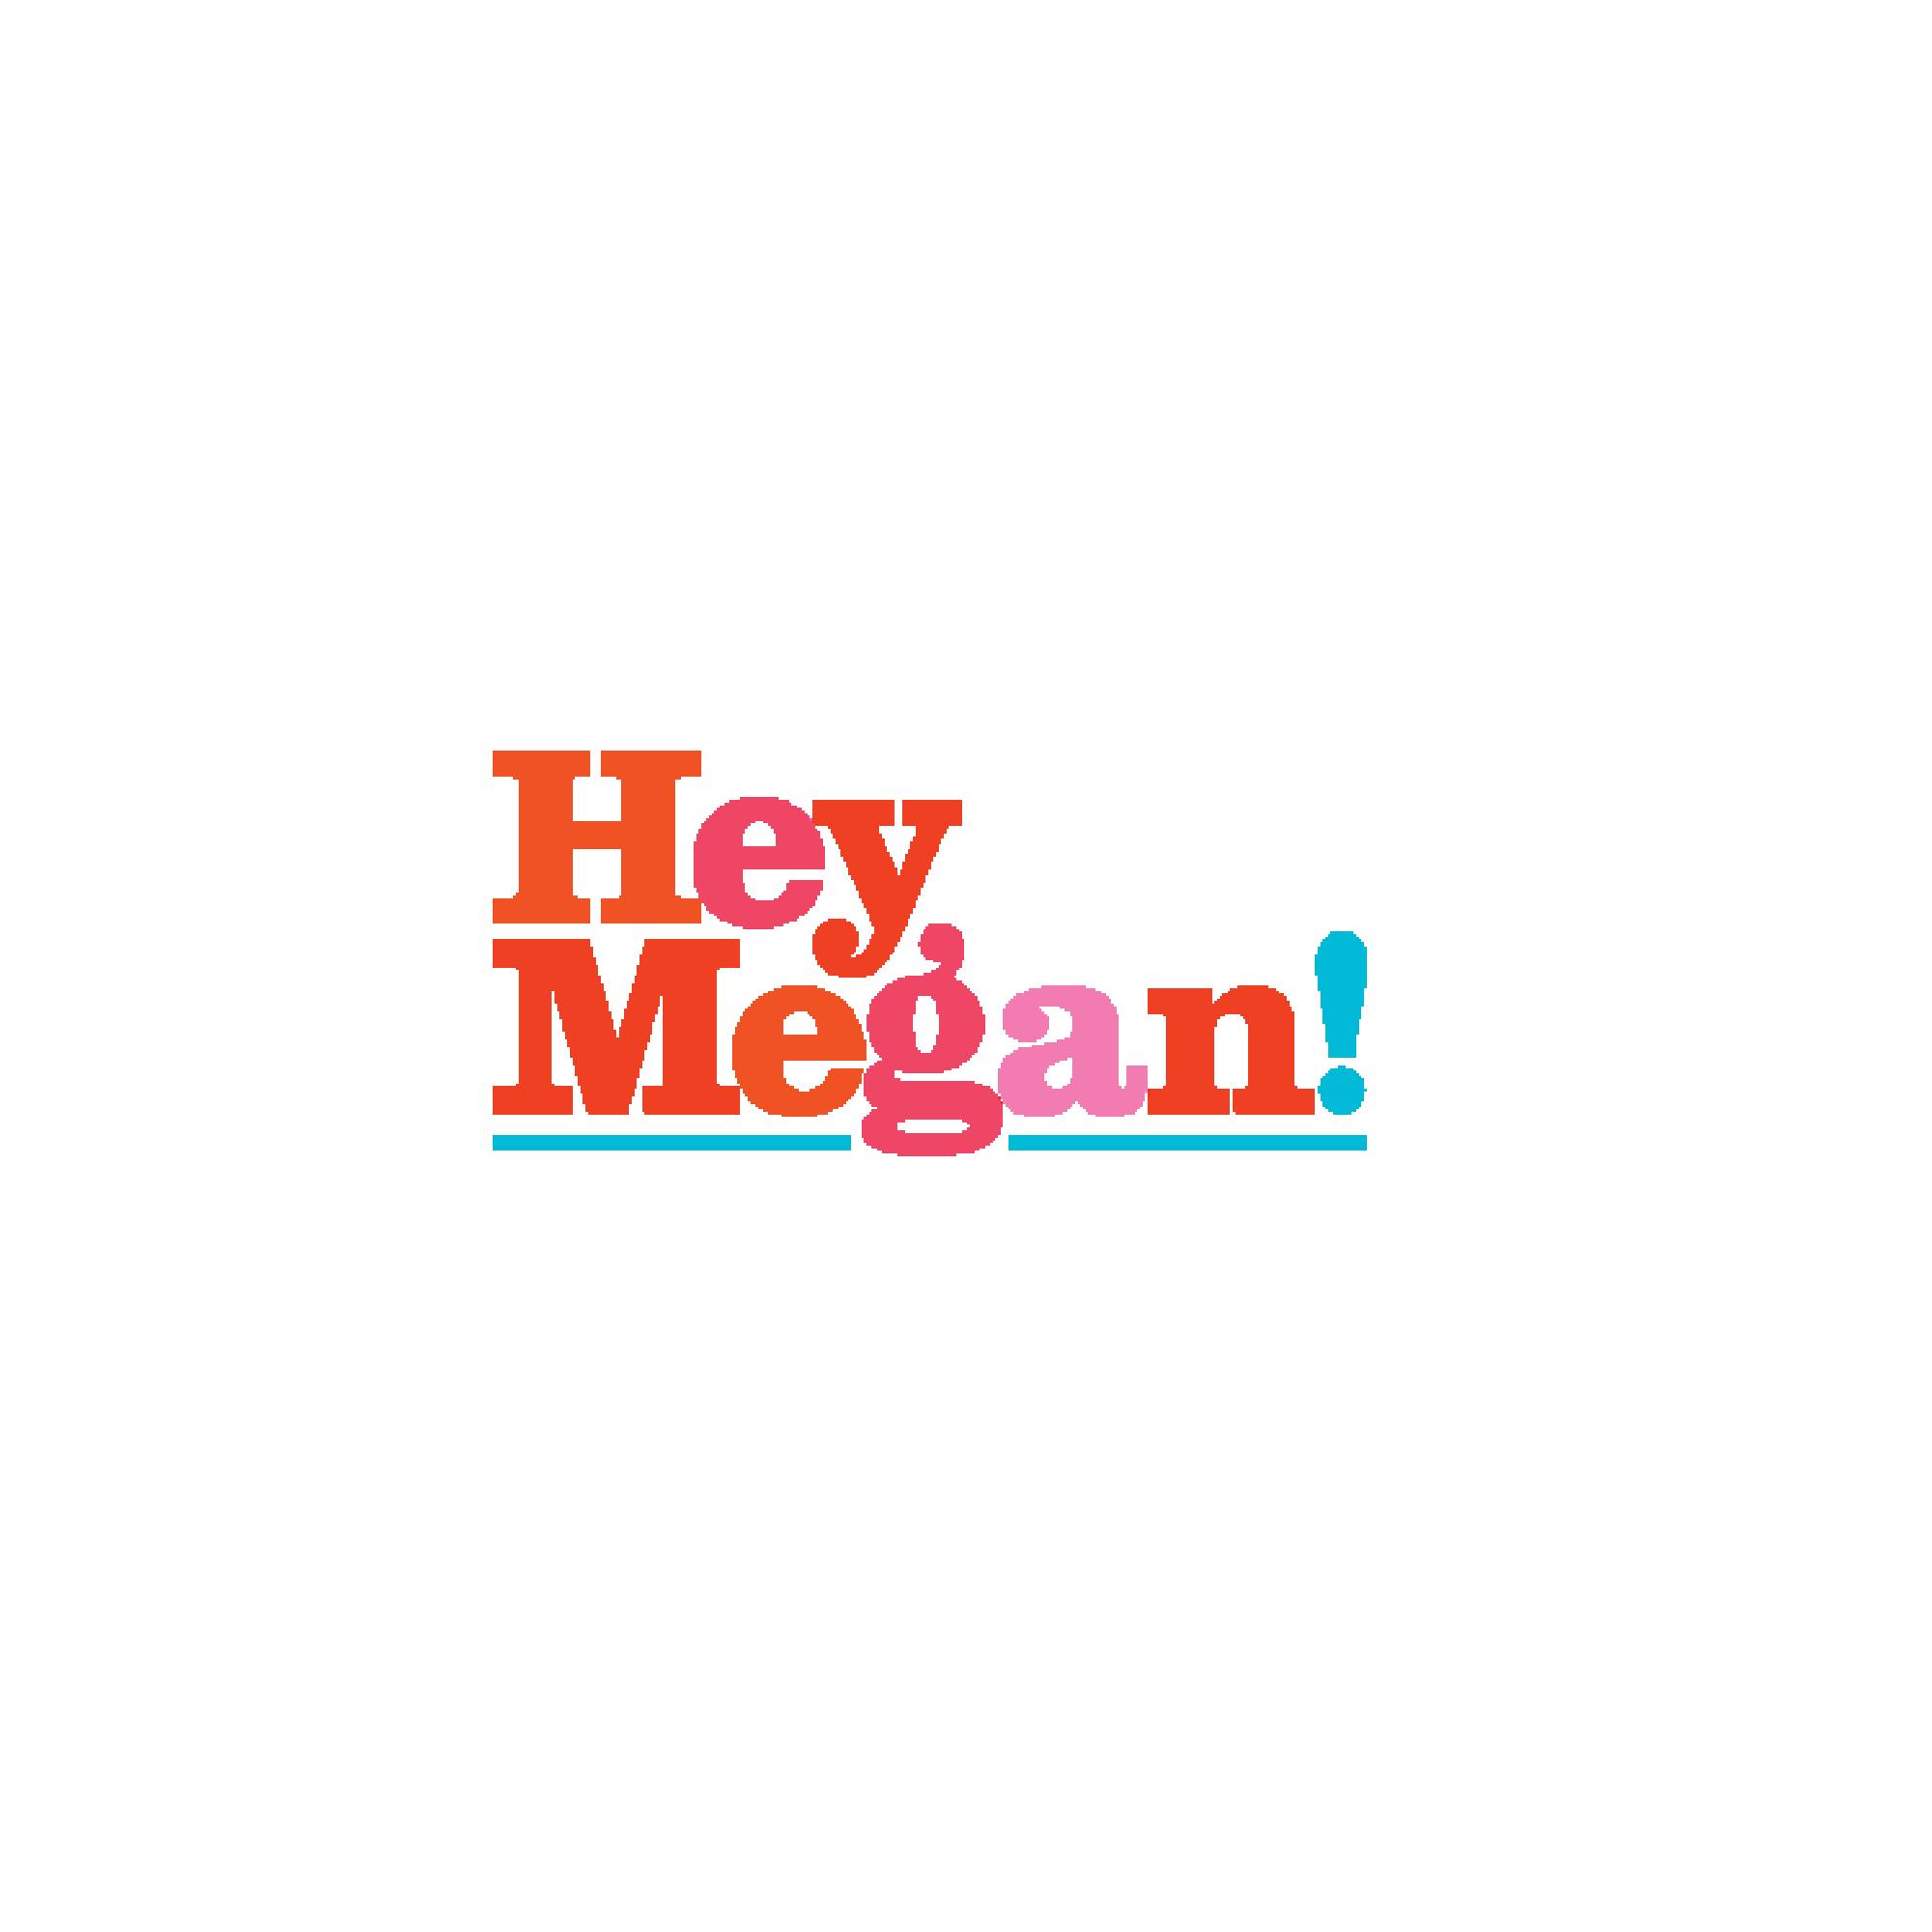 heymegan.png